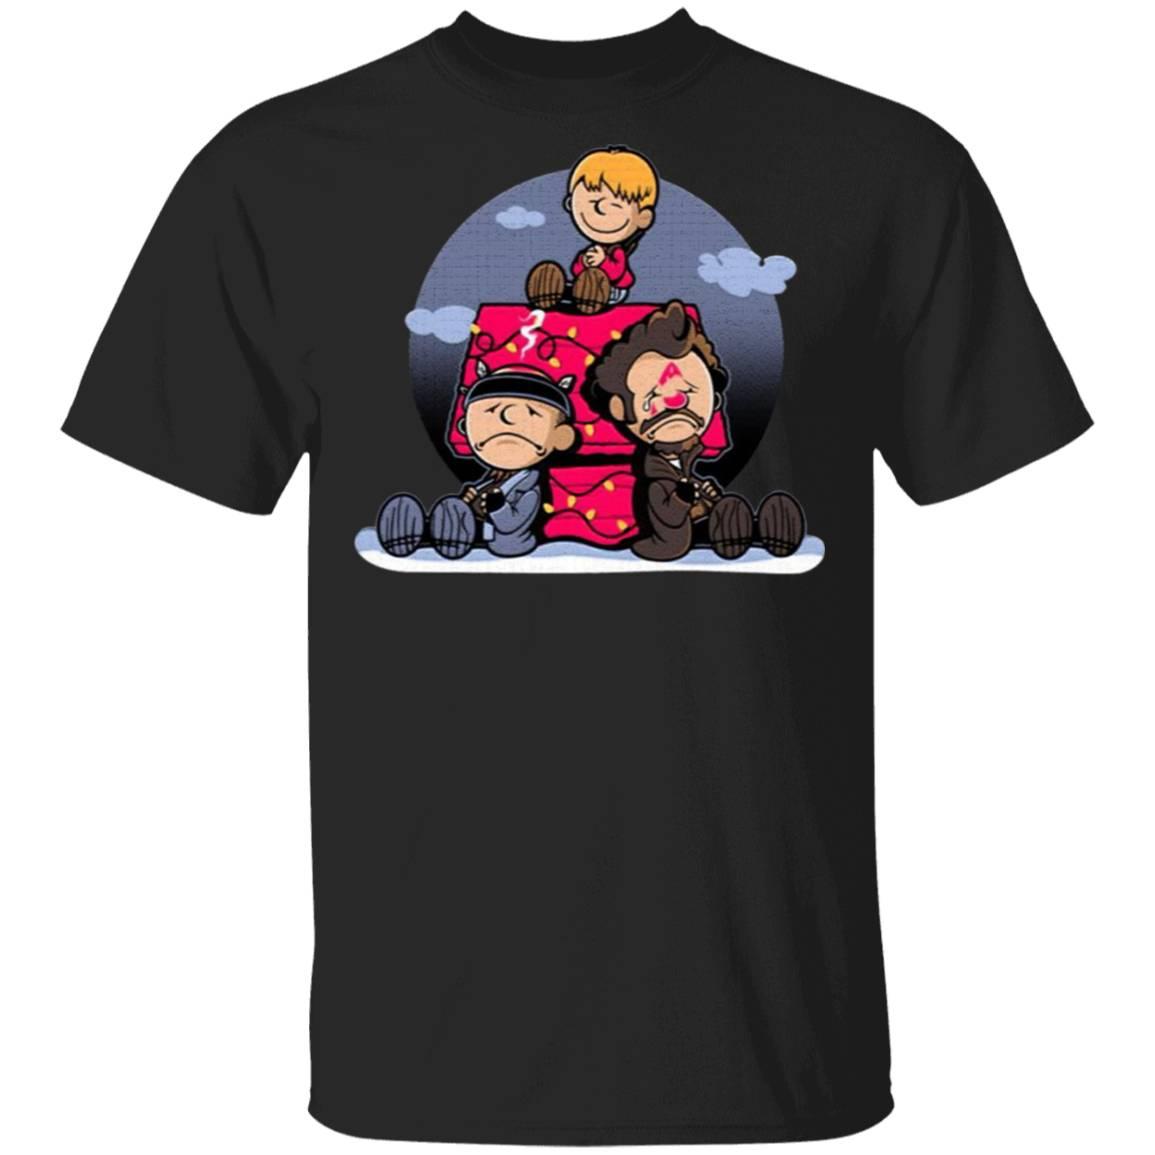 Home Alone Christmas T-Shirt